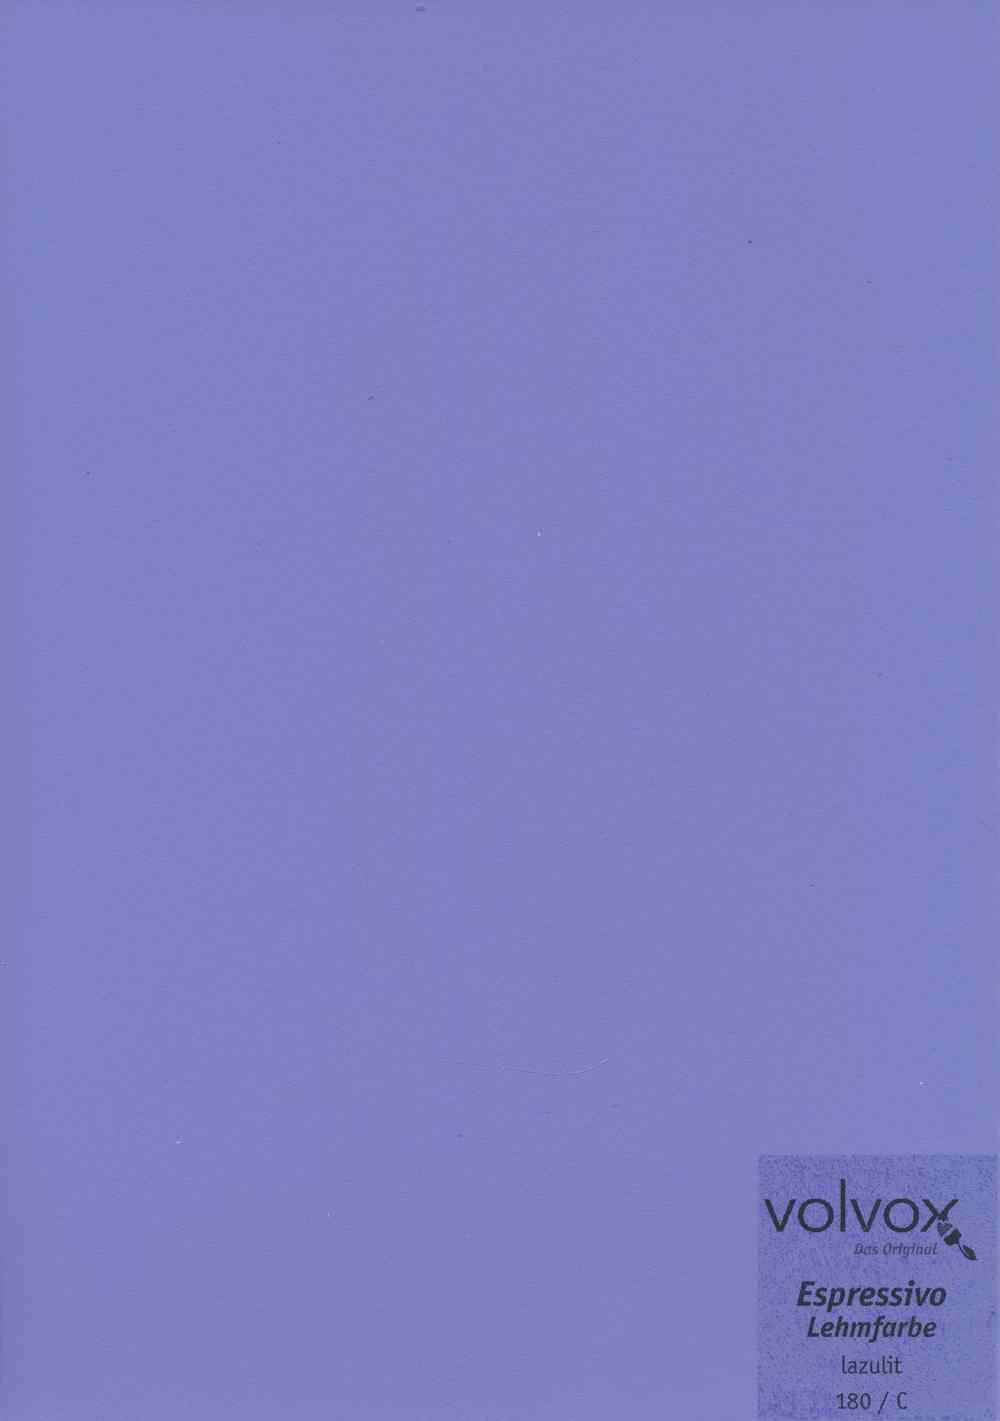 Volvox Espressivo Lehmfarbe 180 lazulit